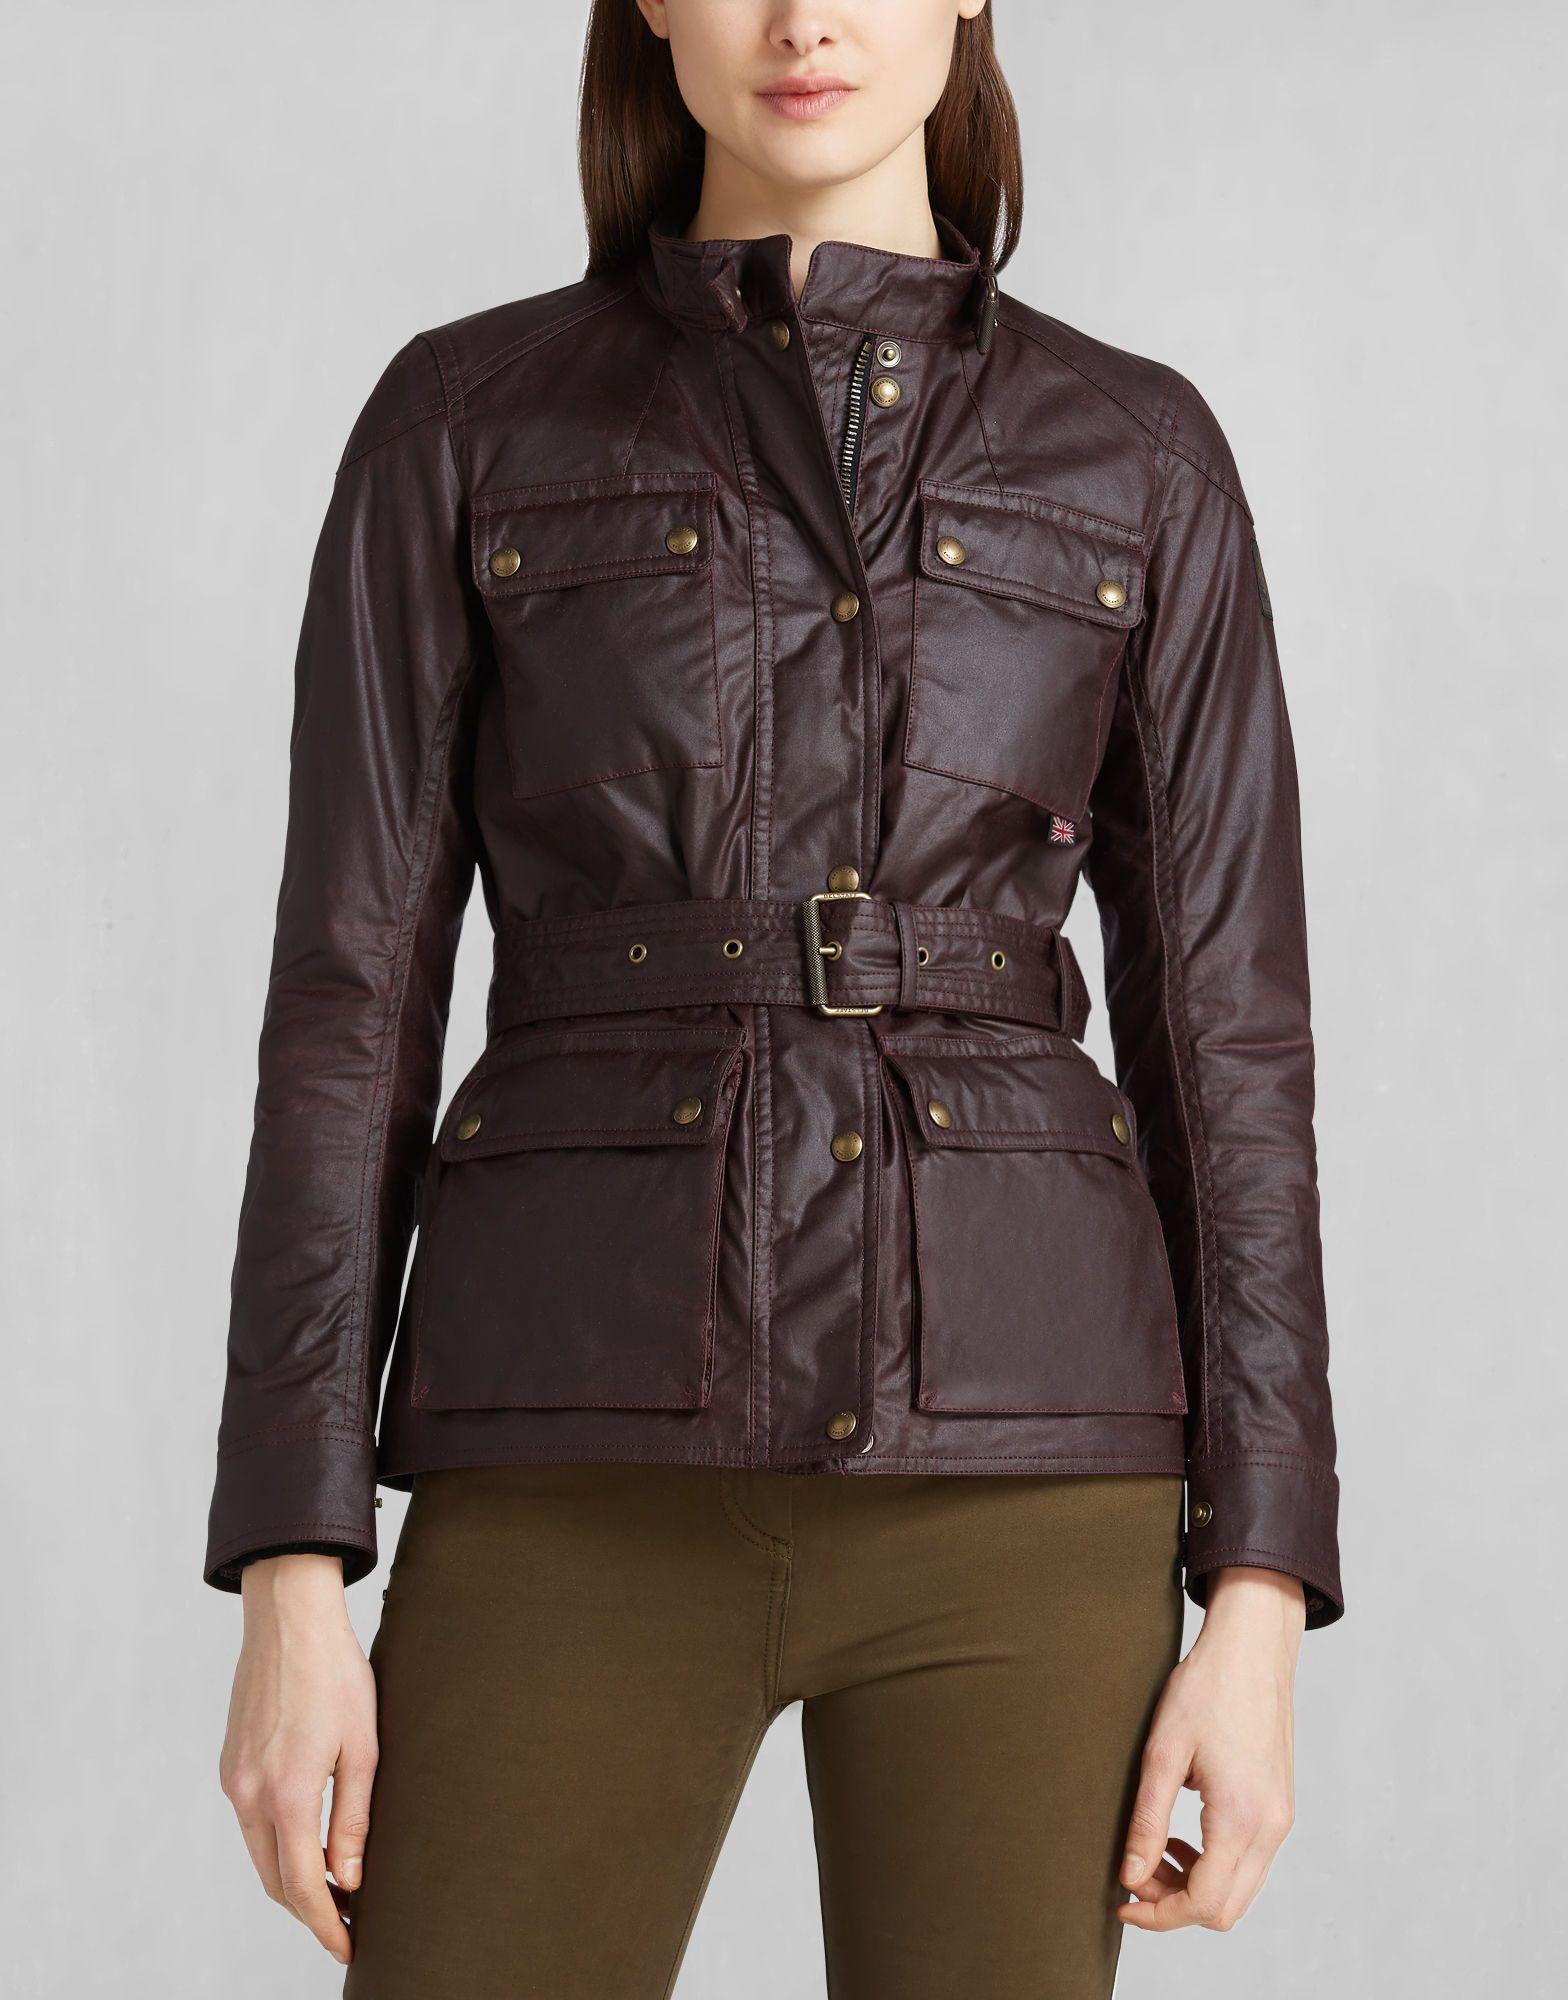 d863e595ac3 Roadmaster Jacket - Rosewood | Wardrobe | Waxed cotton jacket ...